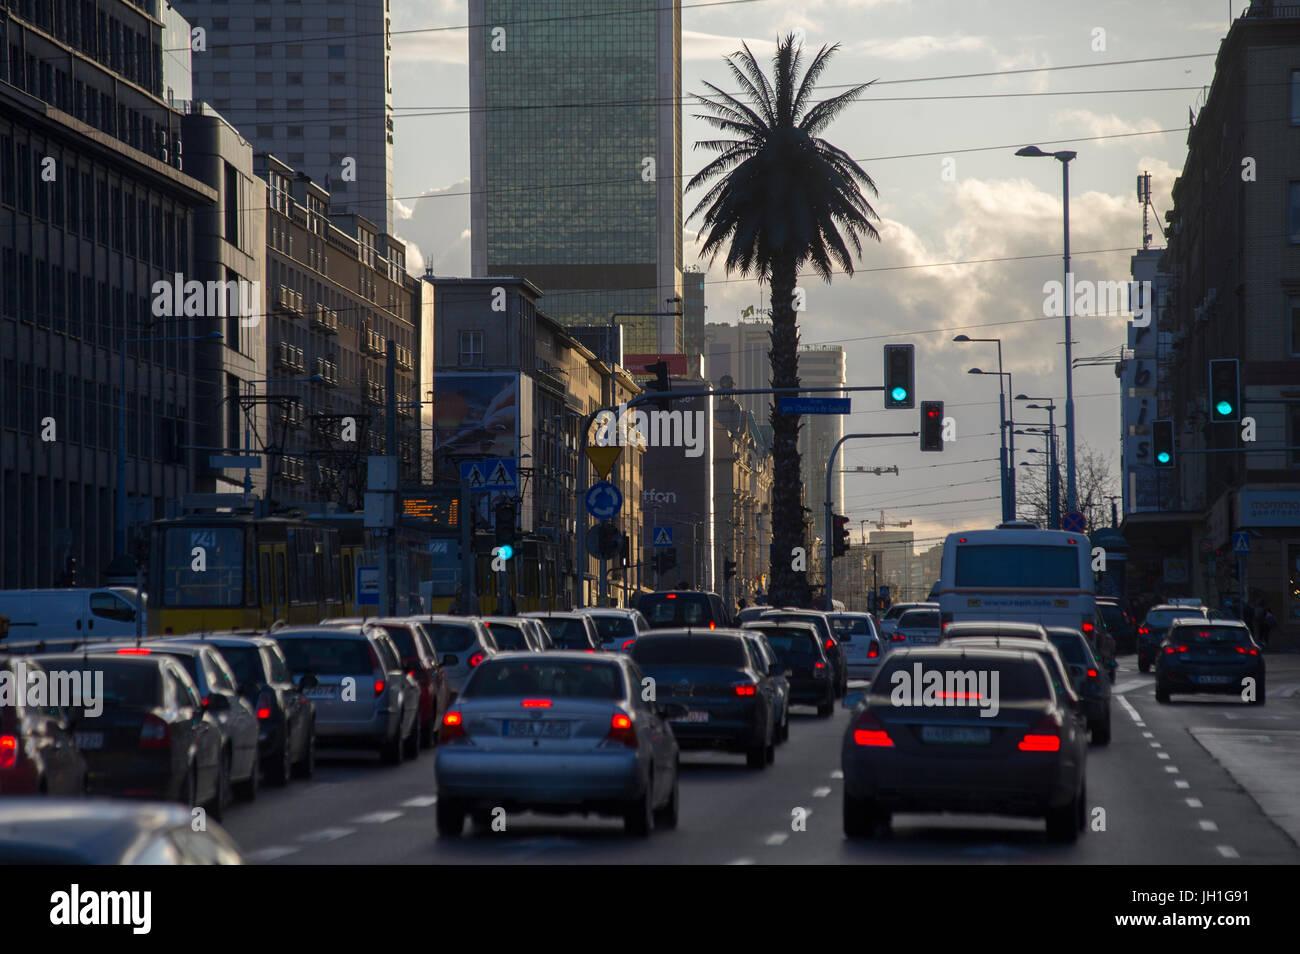 An artificial date palm called Greetings from Jerusalem Avenues (Pozdrowienia z Alej Jerozolimskich) on Charles - Stock Image